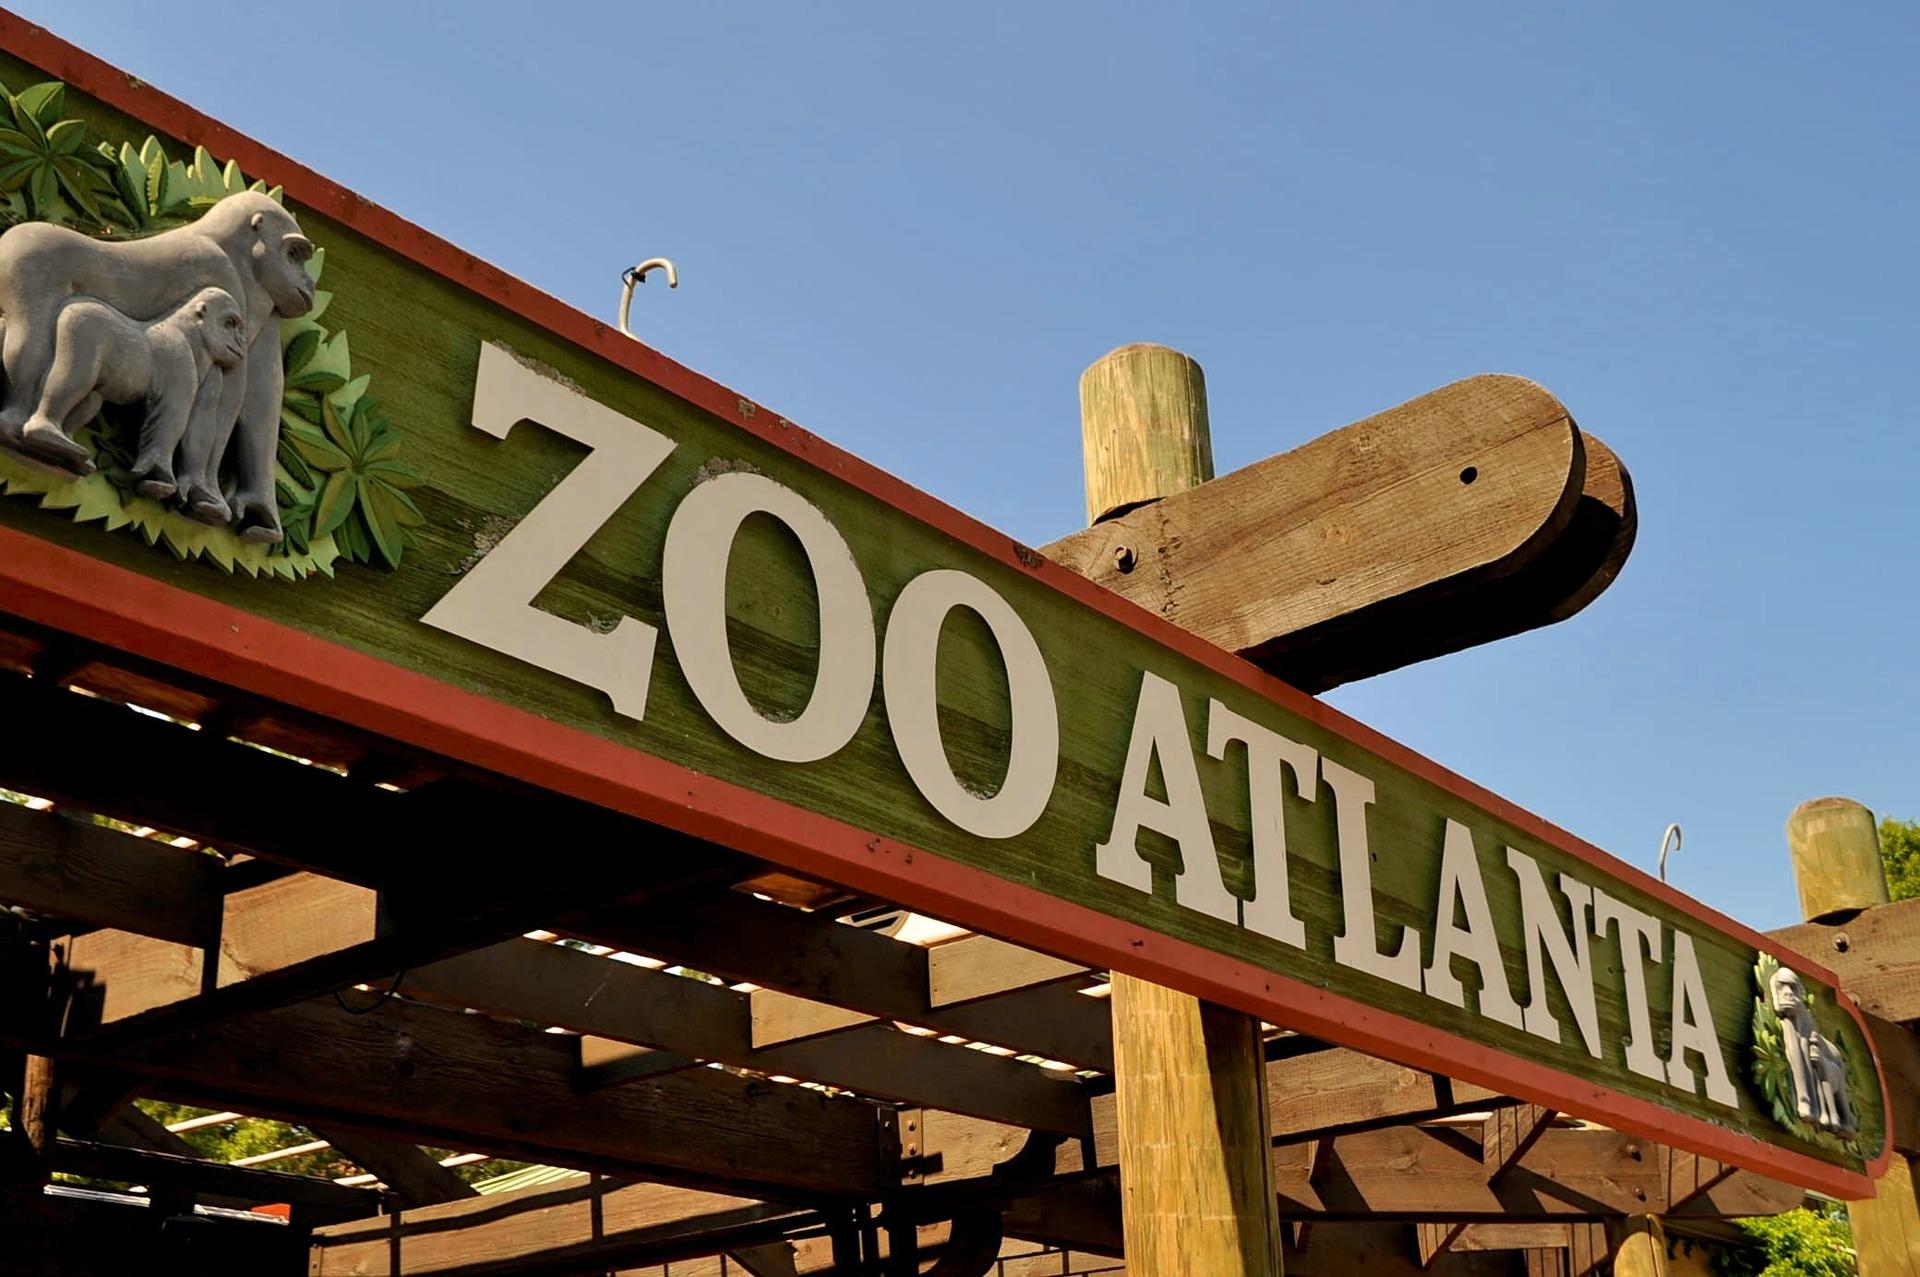 Zoo Atlanta sign in Atlanta, Georgia